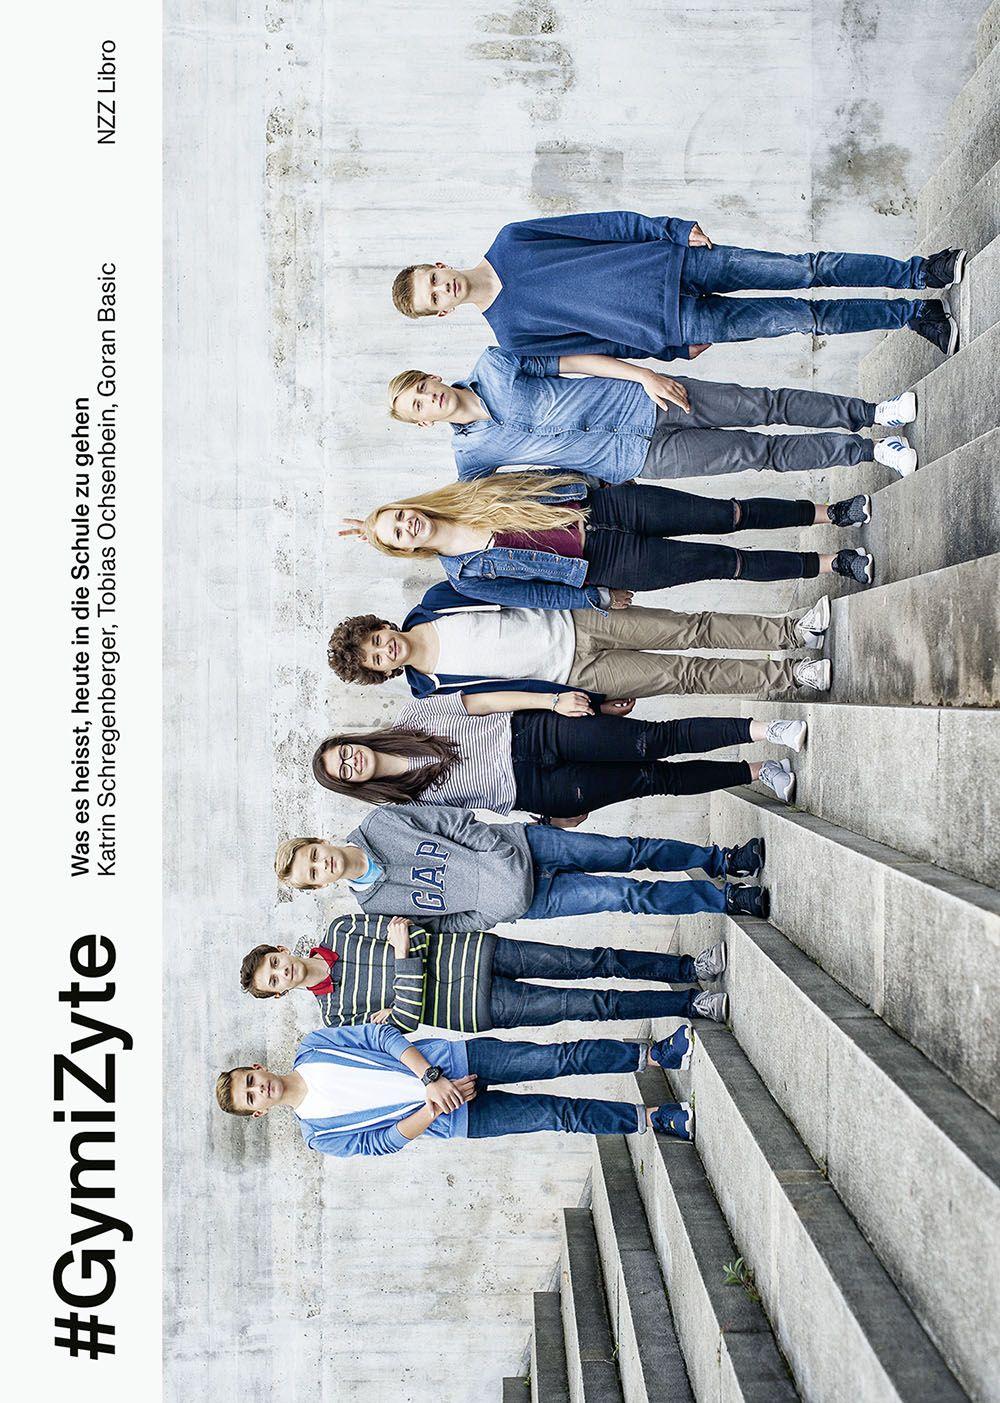 «#GymiZyte», Katrin Schregenberger, Tobias Ochsenbein, Goran Basic, Basel 2020, Signatur: 2020 A 21472